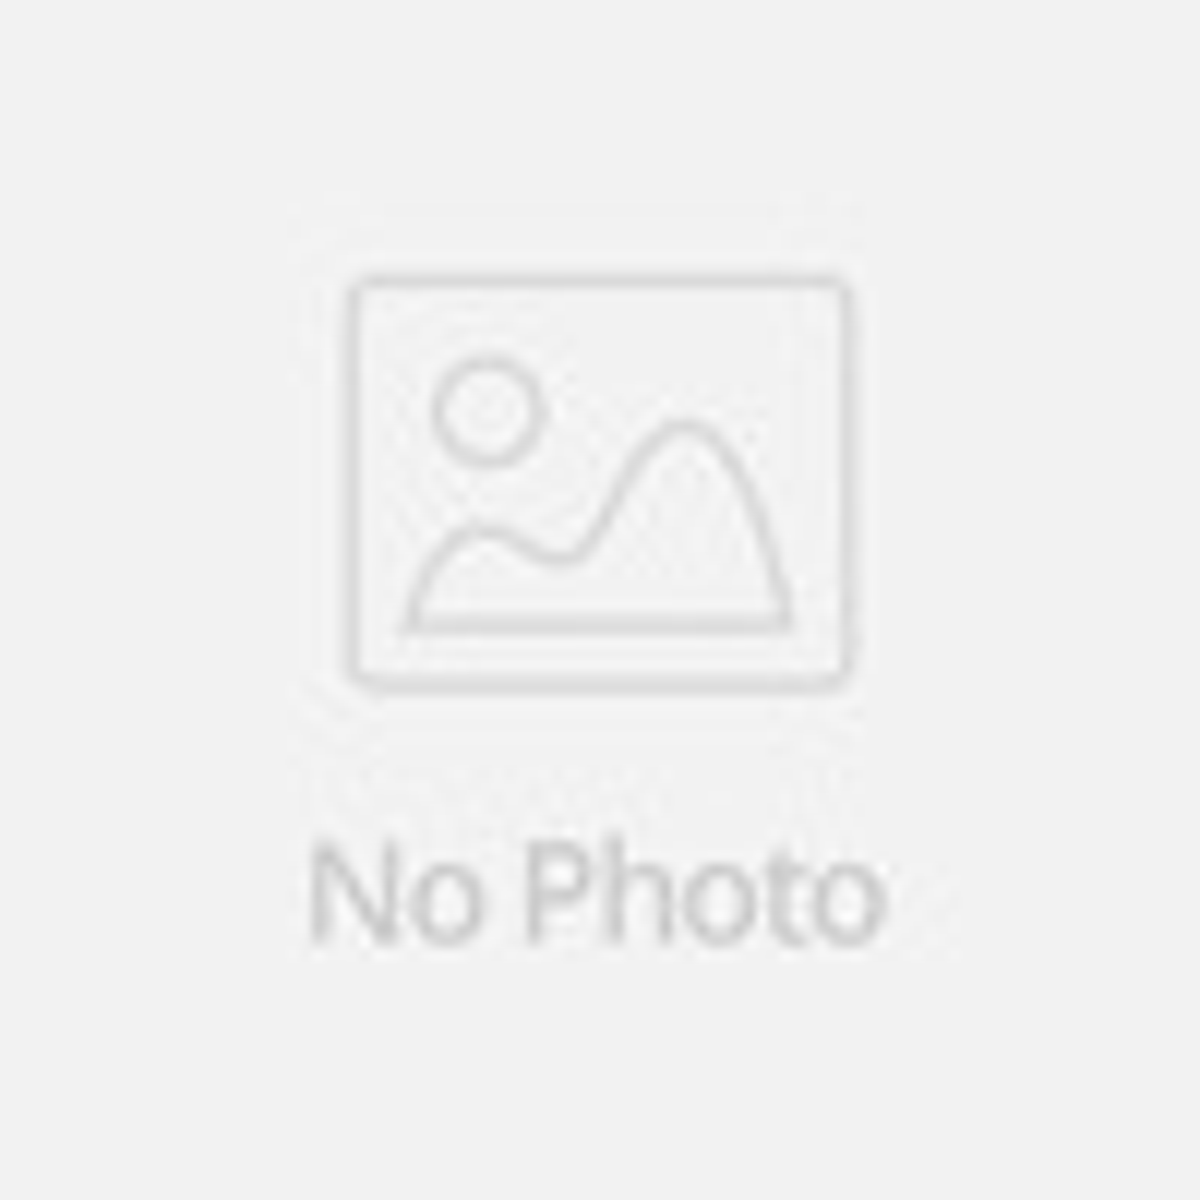 Red Eye Makeup Brushes 15Pcs Professional Makeup Brush Set Cosmetics Eyeliner Eyeshadow Make Up Tools Beauty Pencil Brush Kits professional eye brush 15pcs